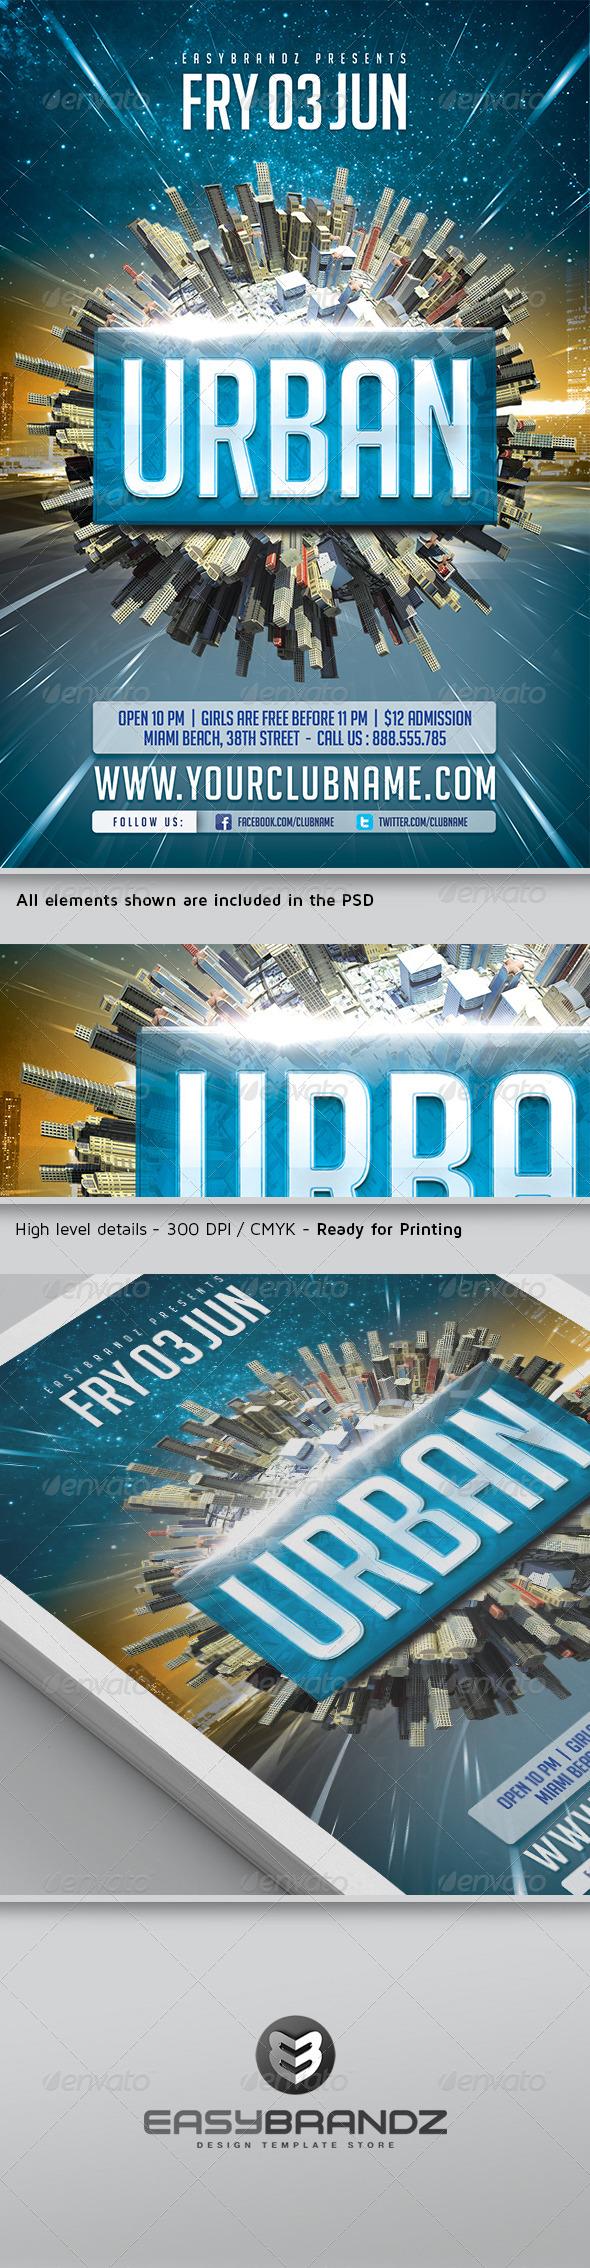 GraphicRiver Urban Flyer Template 5012430